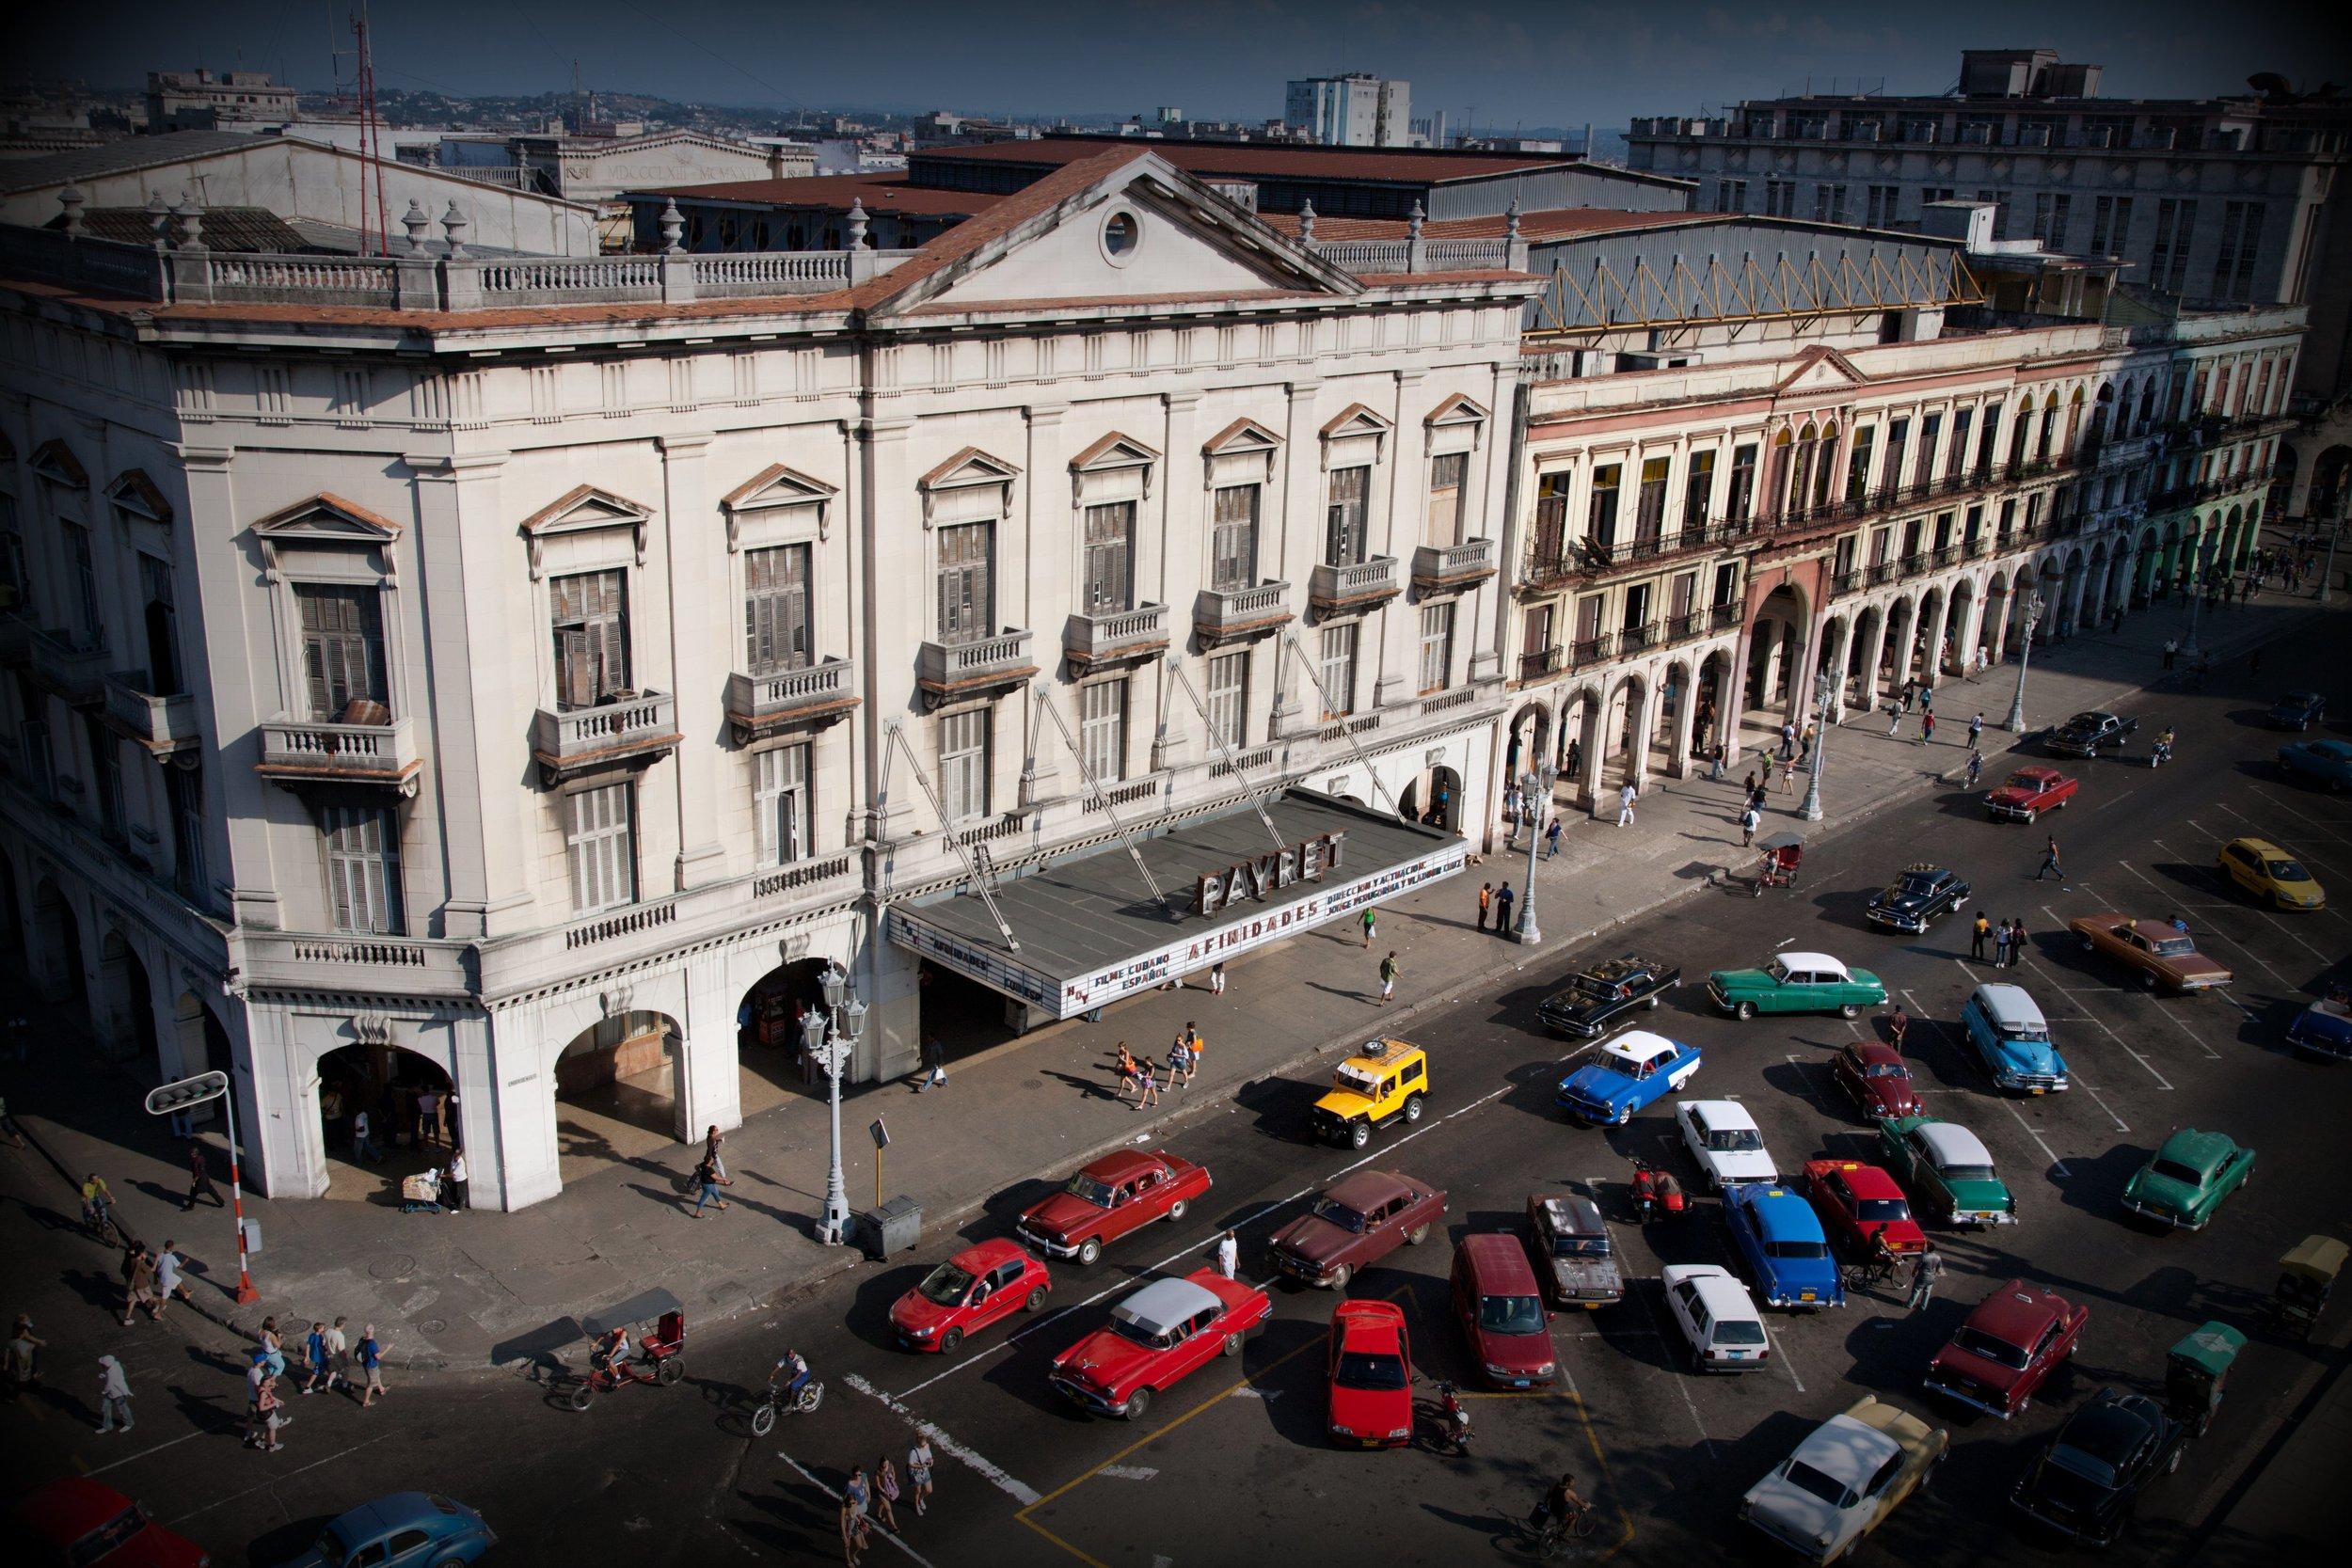 Havana, Cuba (Source: Wikimedia Commons)